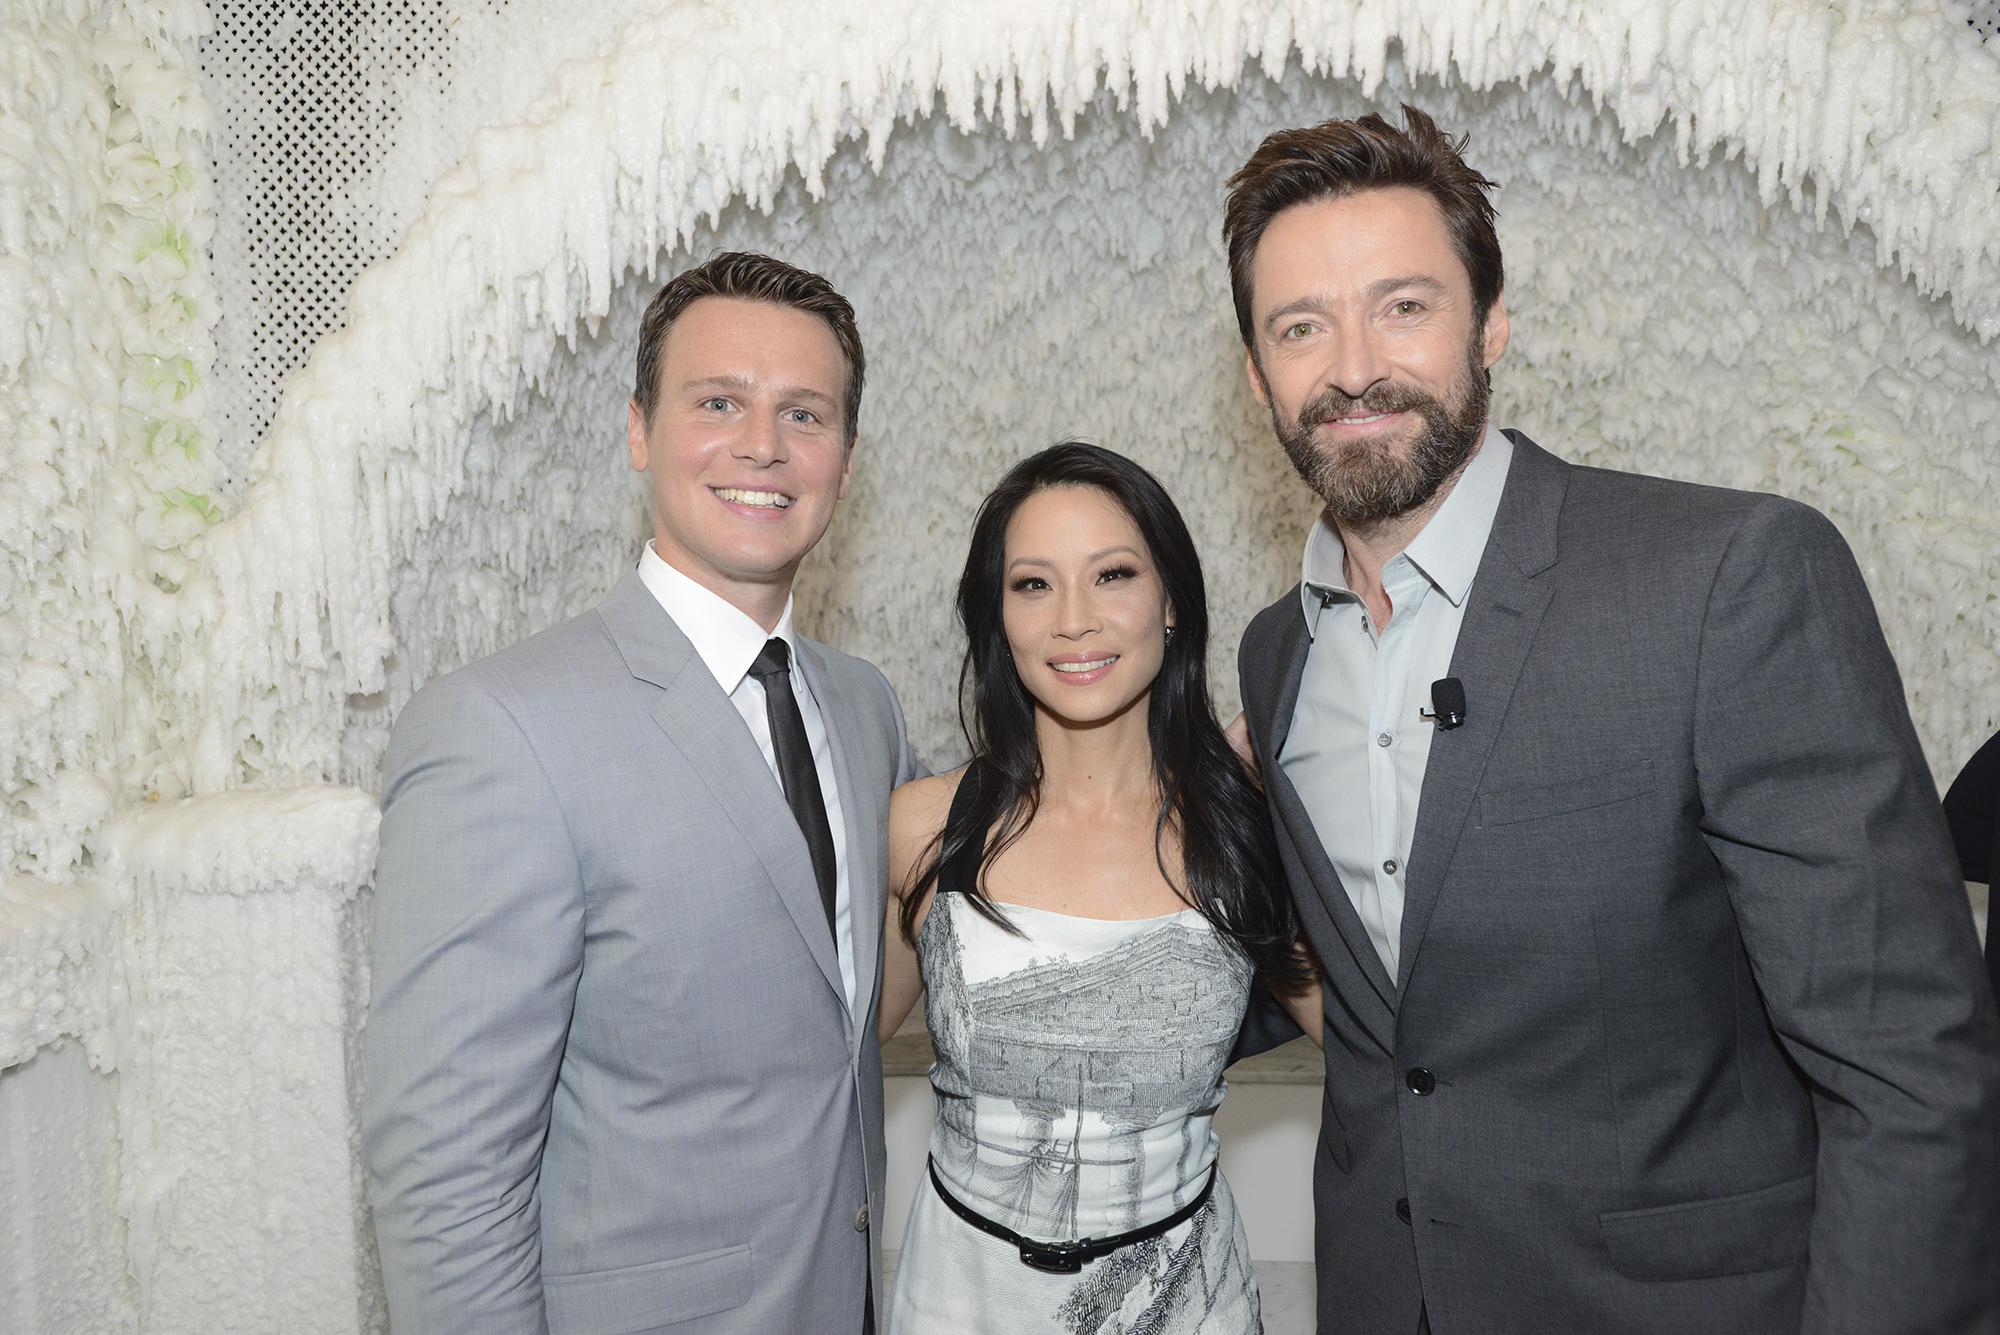 2014 Tony Awards Nominations Video Announcement - CBS.com